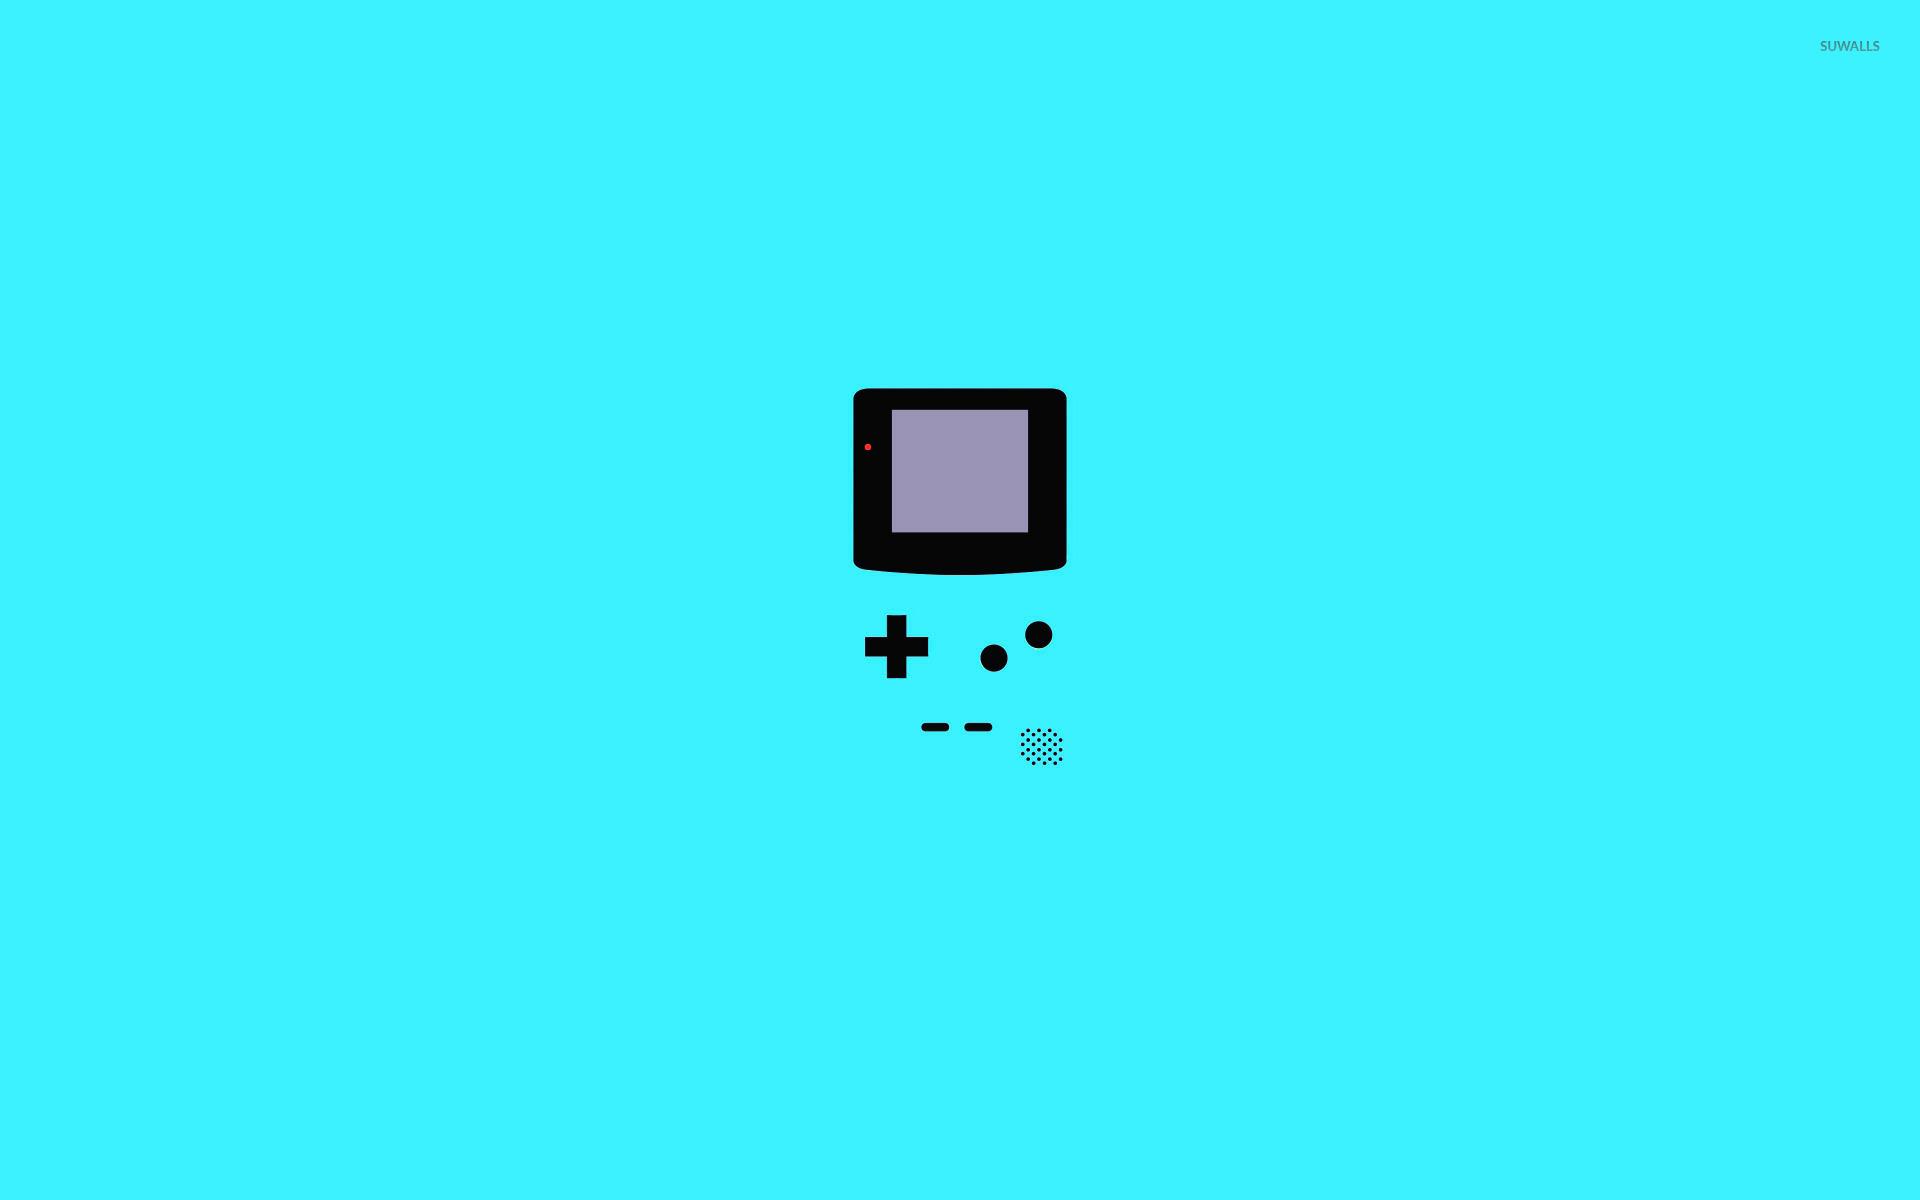 Nintendo Game Boy wallpaper   Minimalistic wallpapers   15966 1920x1200